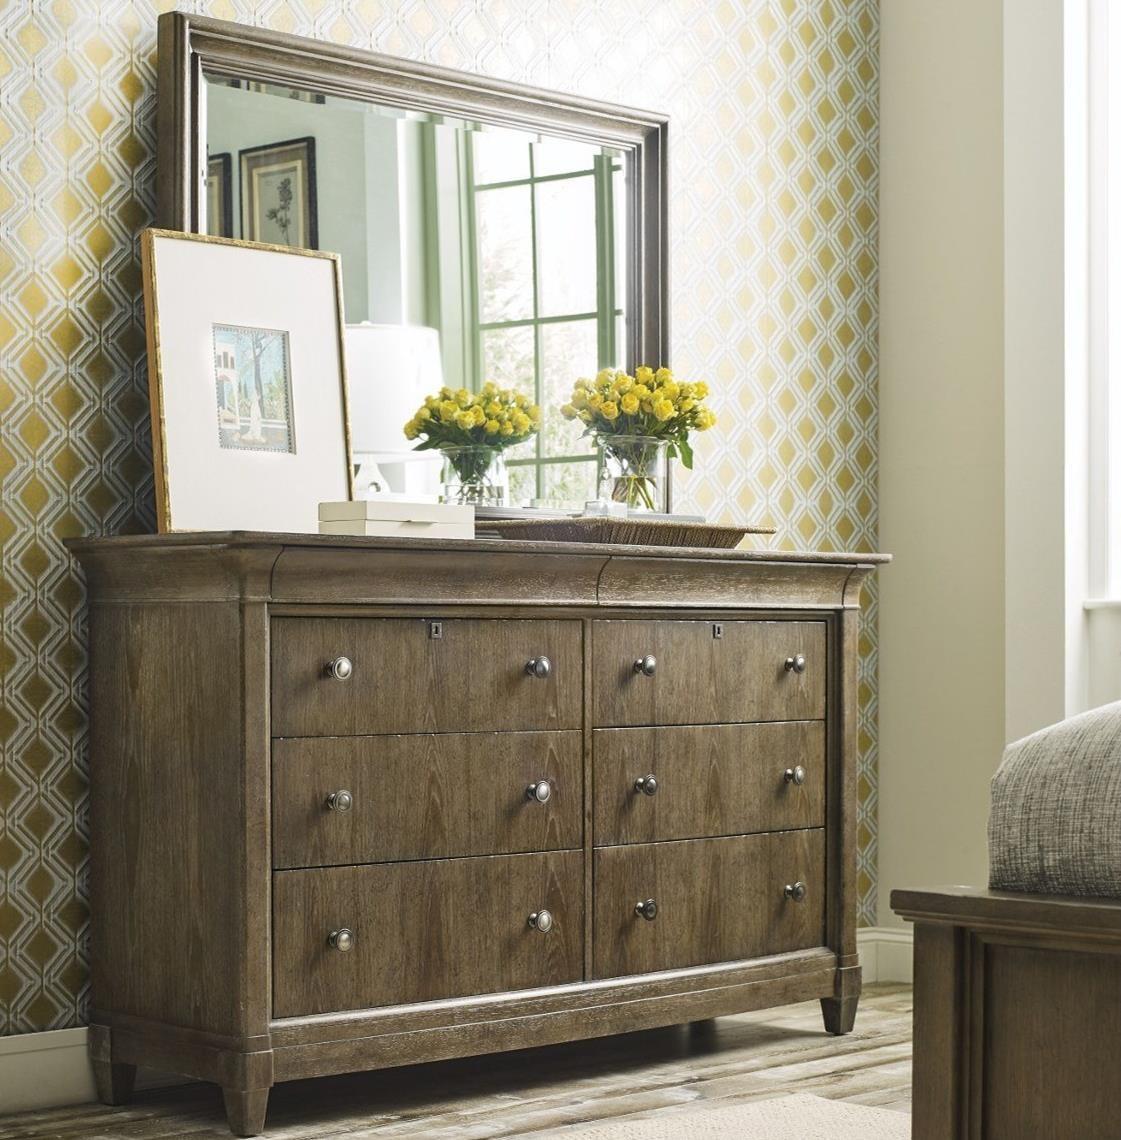 Anson Dresser + Mirror Set by American Drew at Wayside Furniture